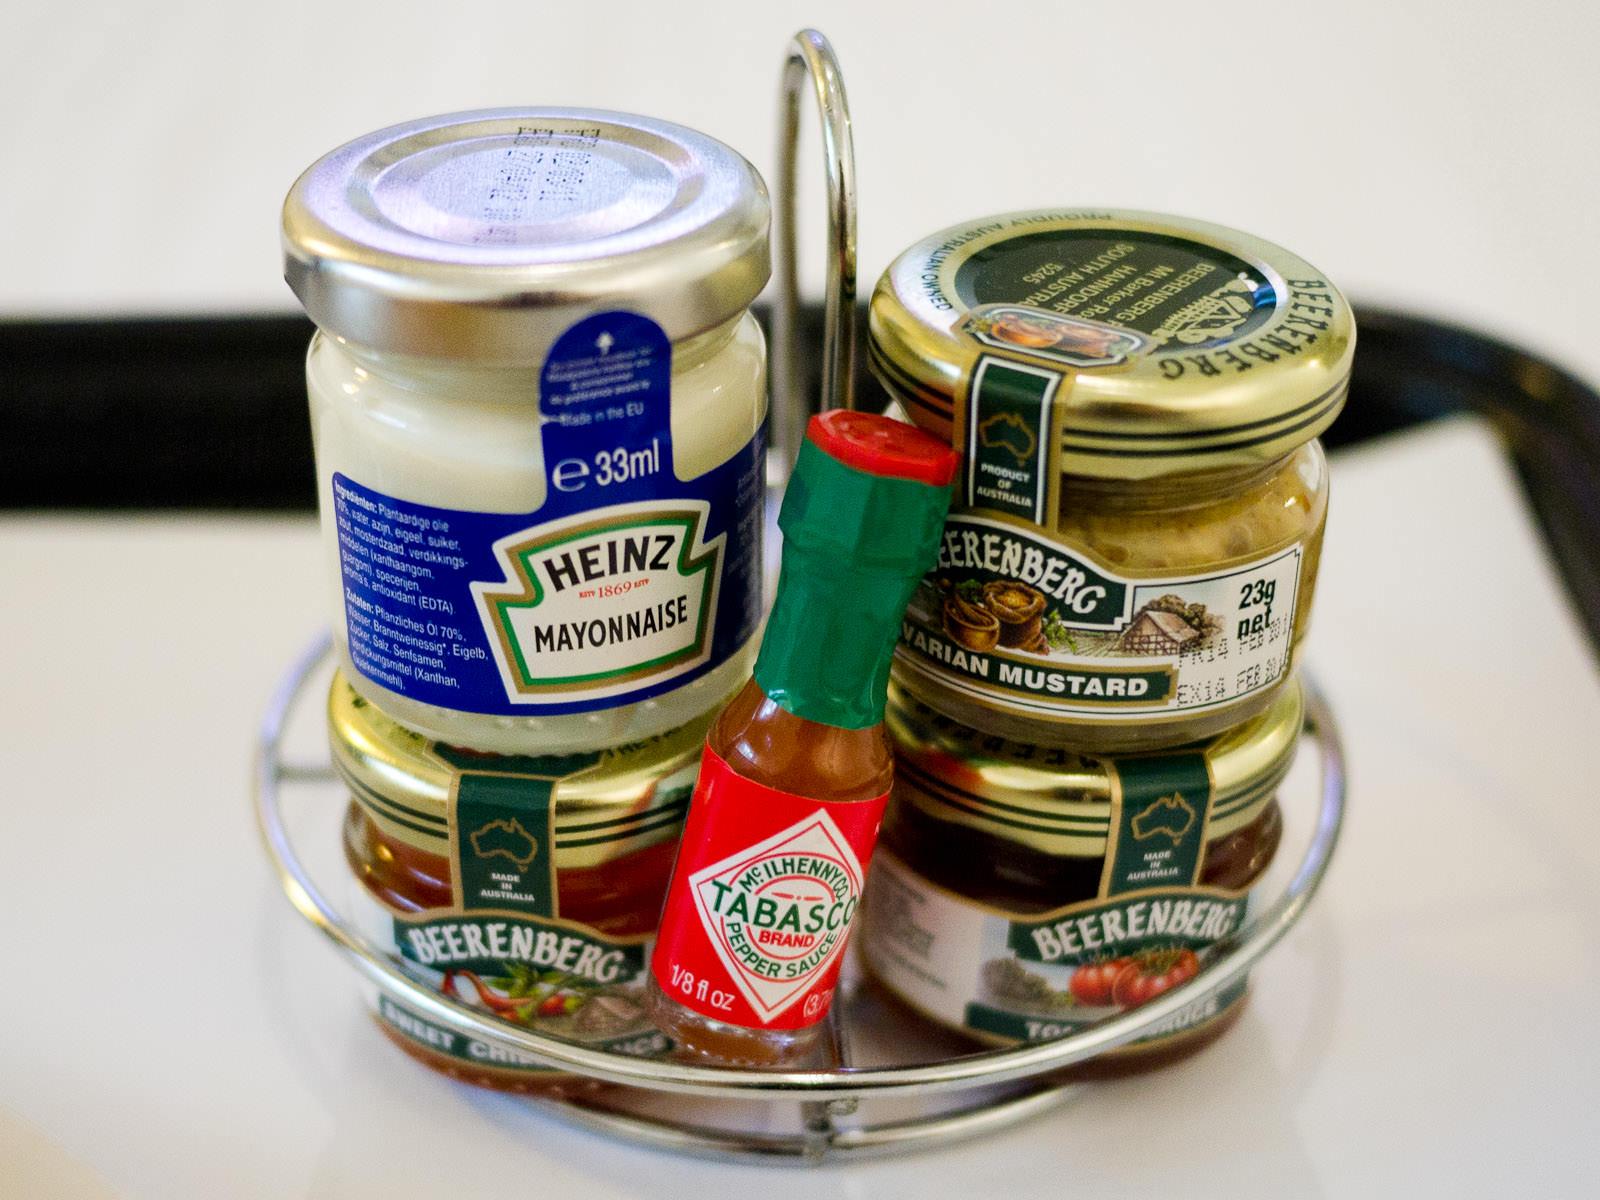 Room service condiments